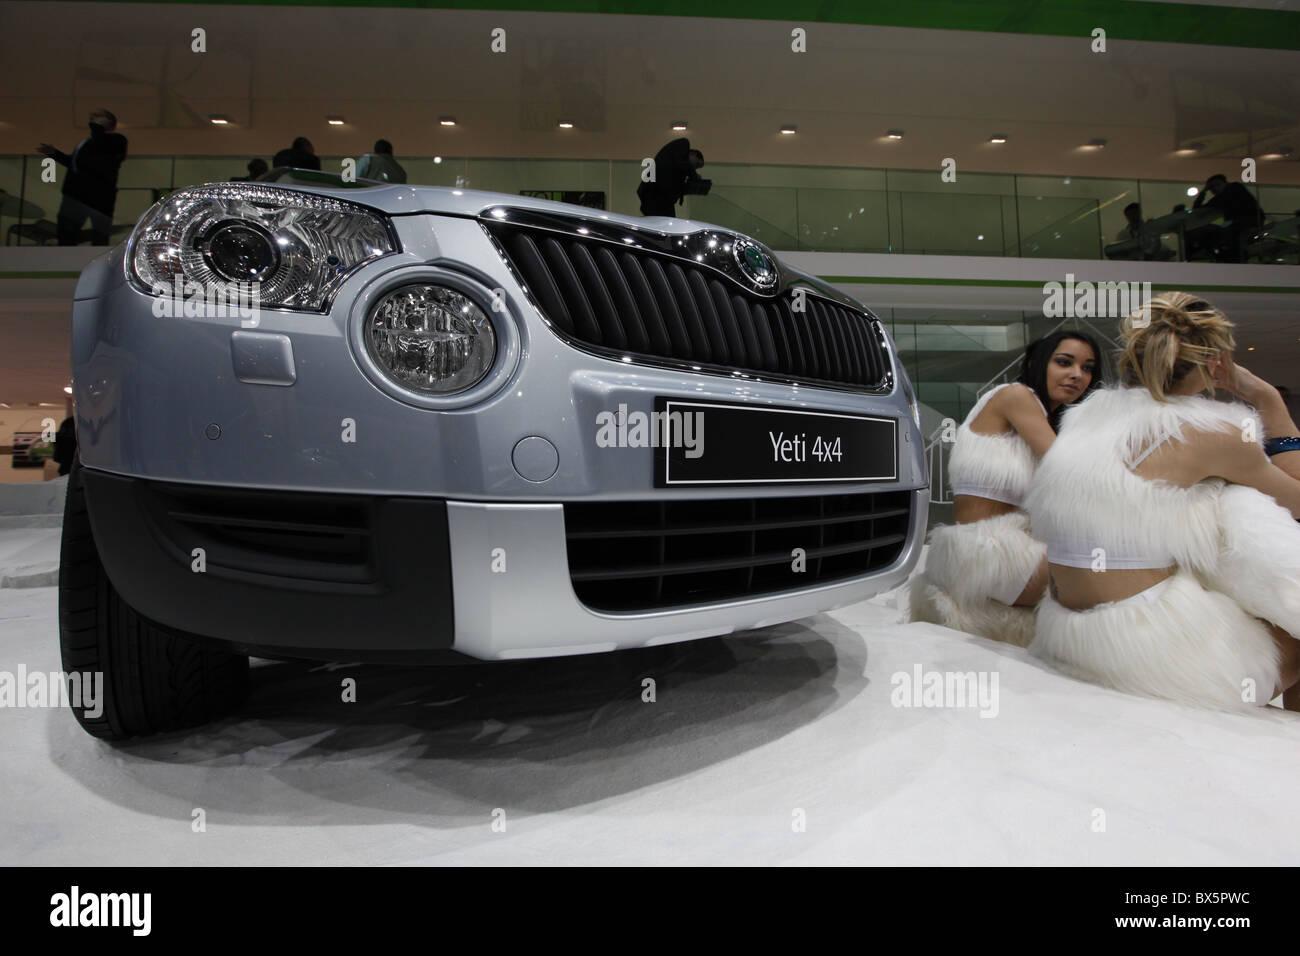 Skoda Yeti during the 79th International Motor Show in